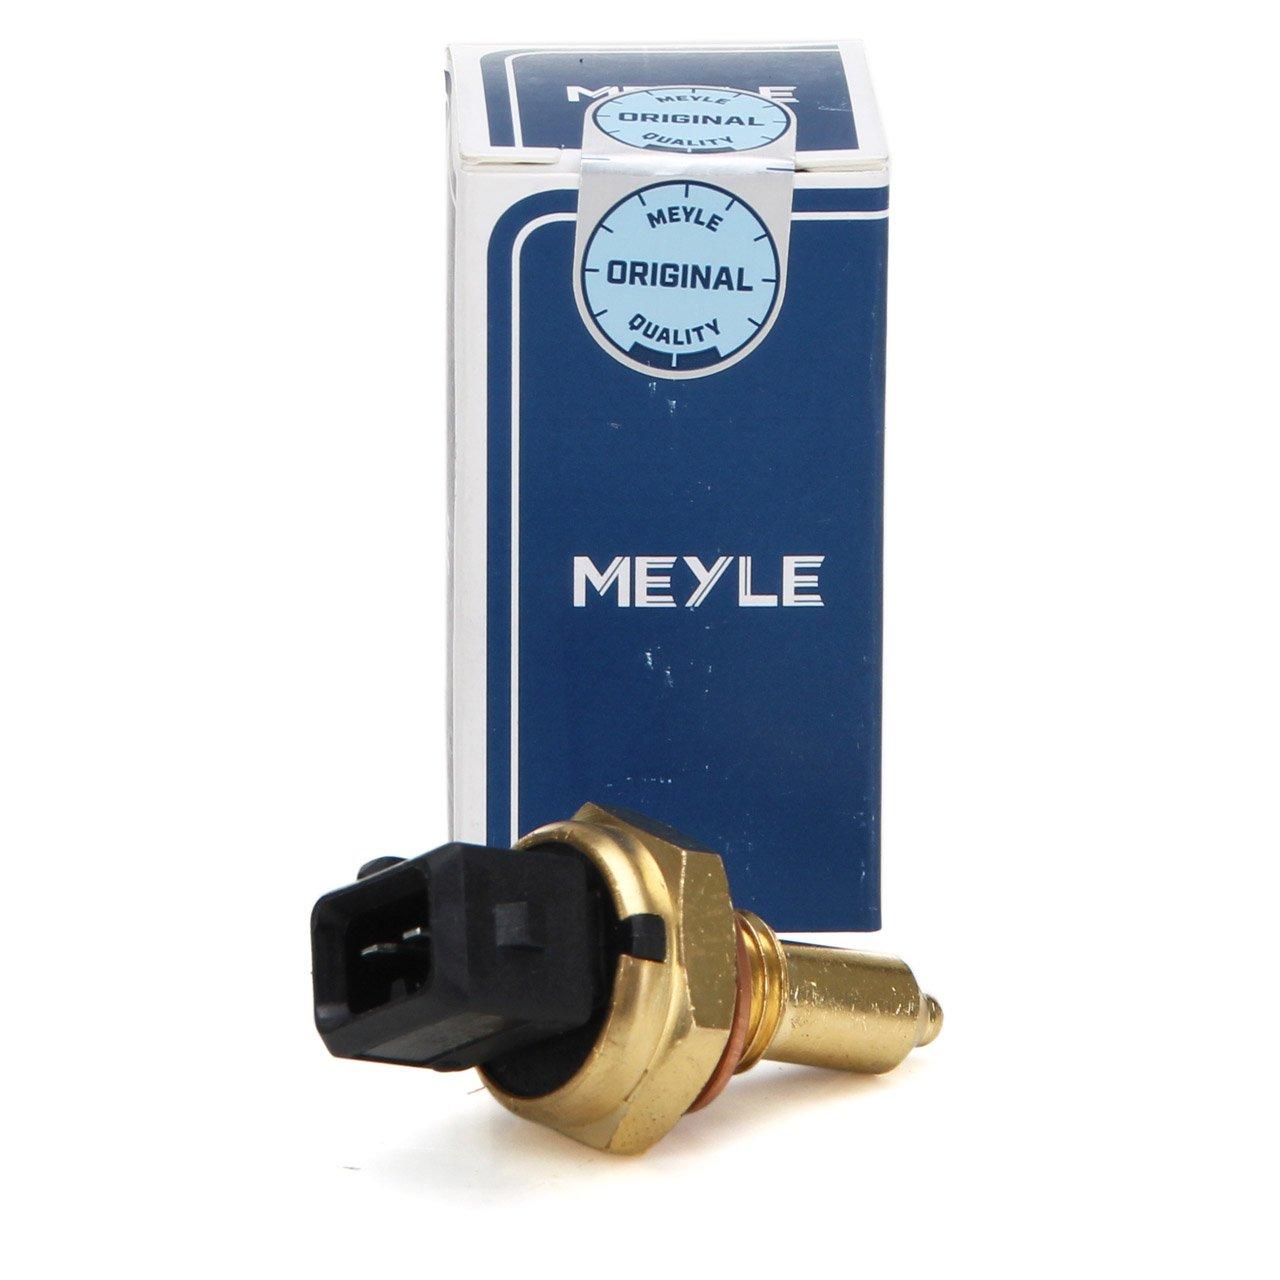 MEYLE 3141362103 Temperaturgeber Kühlmittel BMW 1er 2er 3er 4er 5er 6er 7er X1 X3 X5 Z4